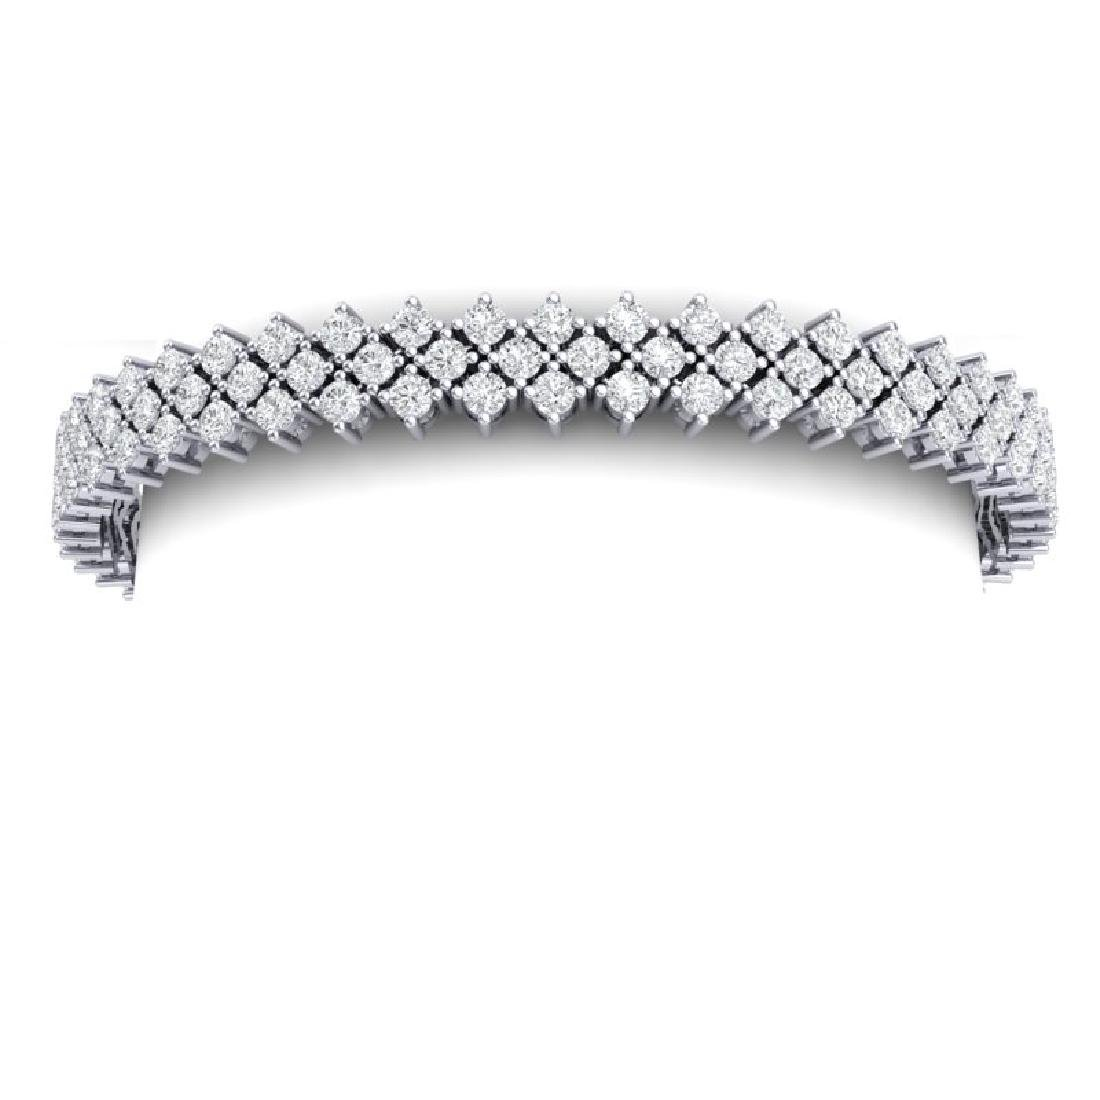 10 CTW Certified SI/I Diamond Bracelet 18K White Gold - 2